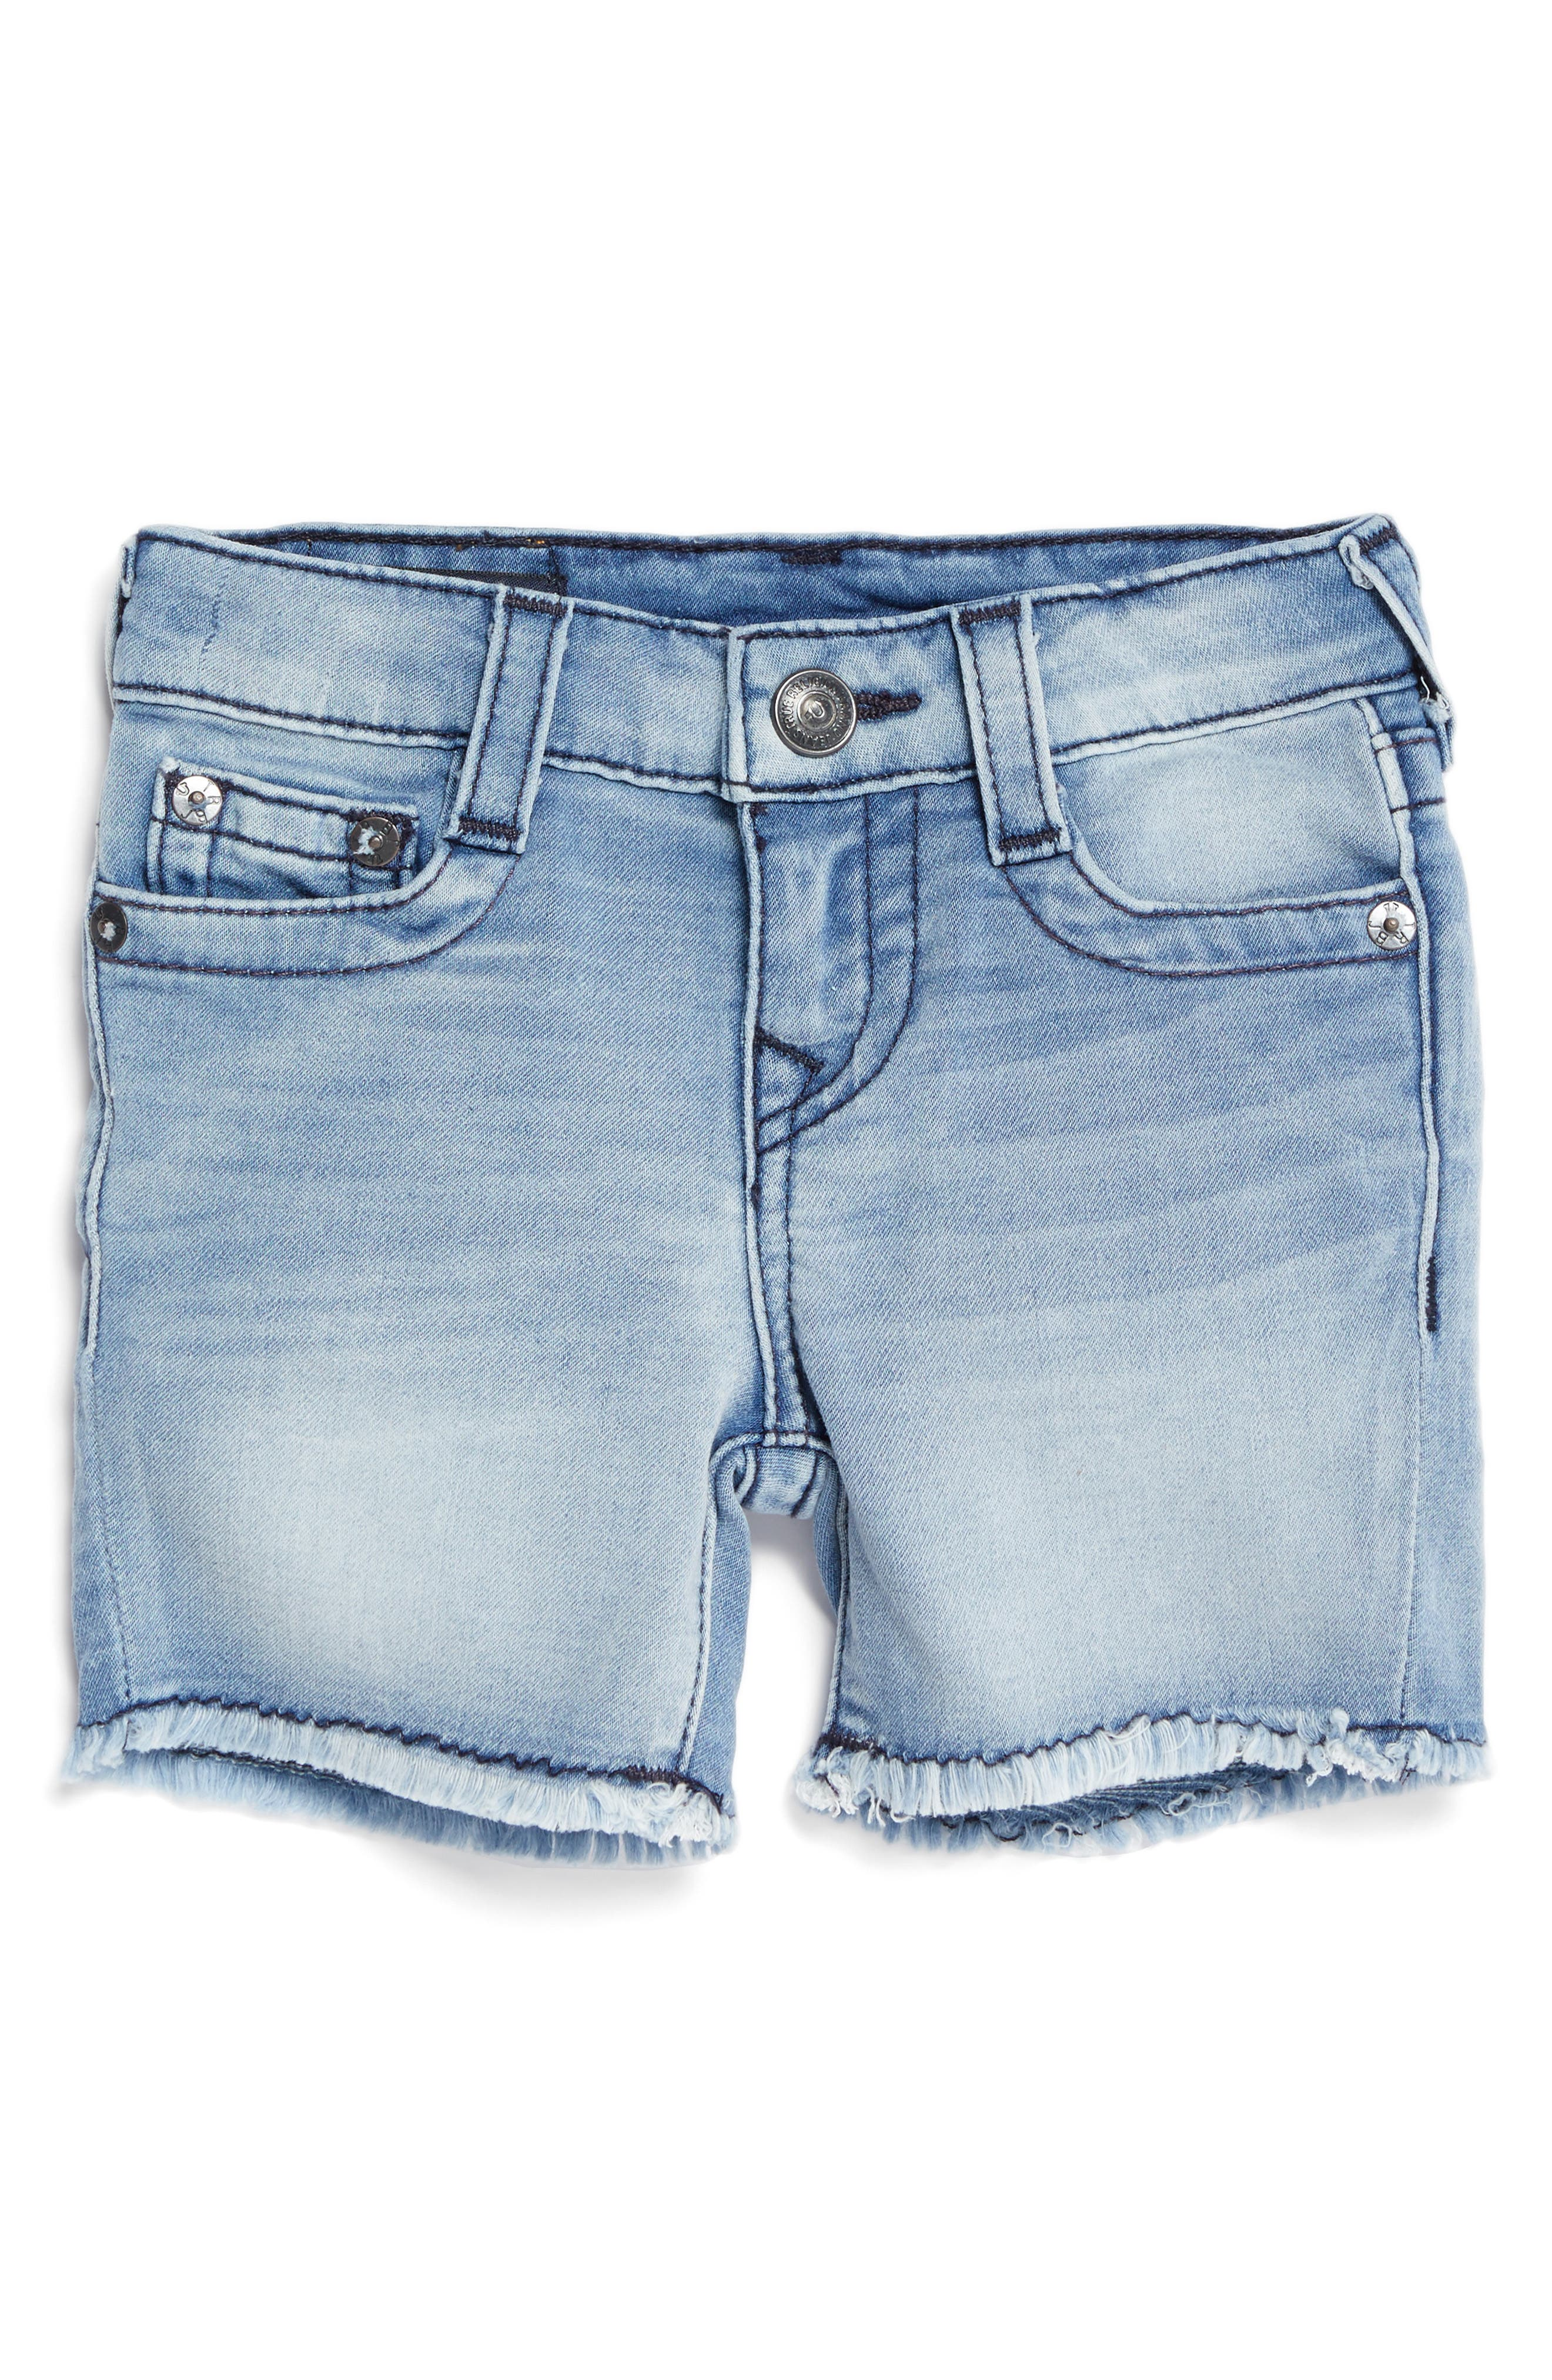 Main Image - True Religion Geno Denim Shorts (Baby)